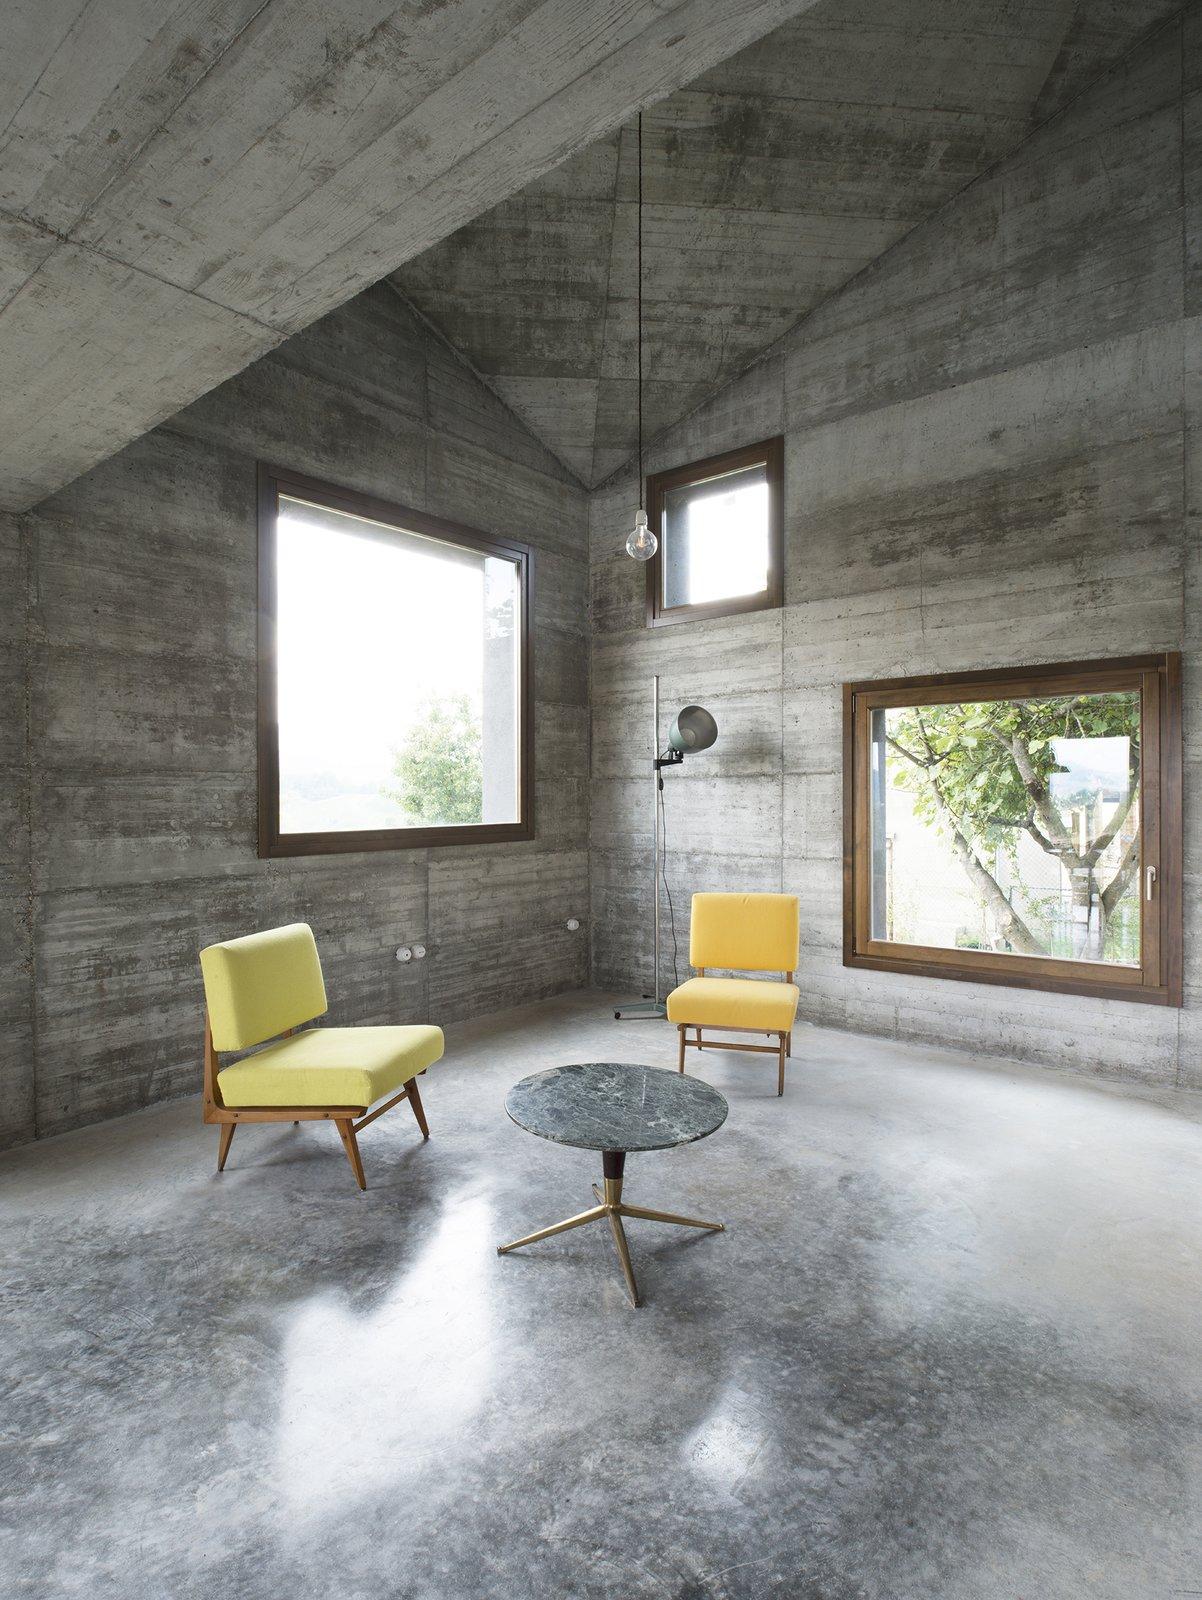 Living Room, Chair, Sofa, End Tables, Ceiling Lighting, Pendant Lighting, Floor Lighting, and Concrete Floor  HOUSE R